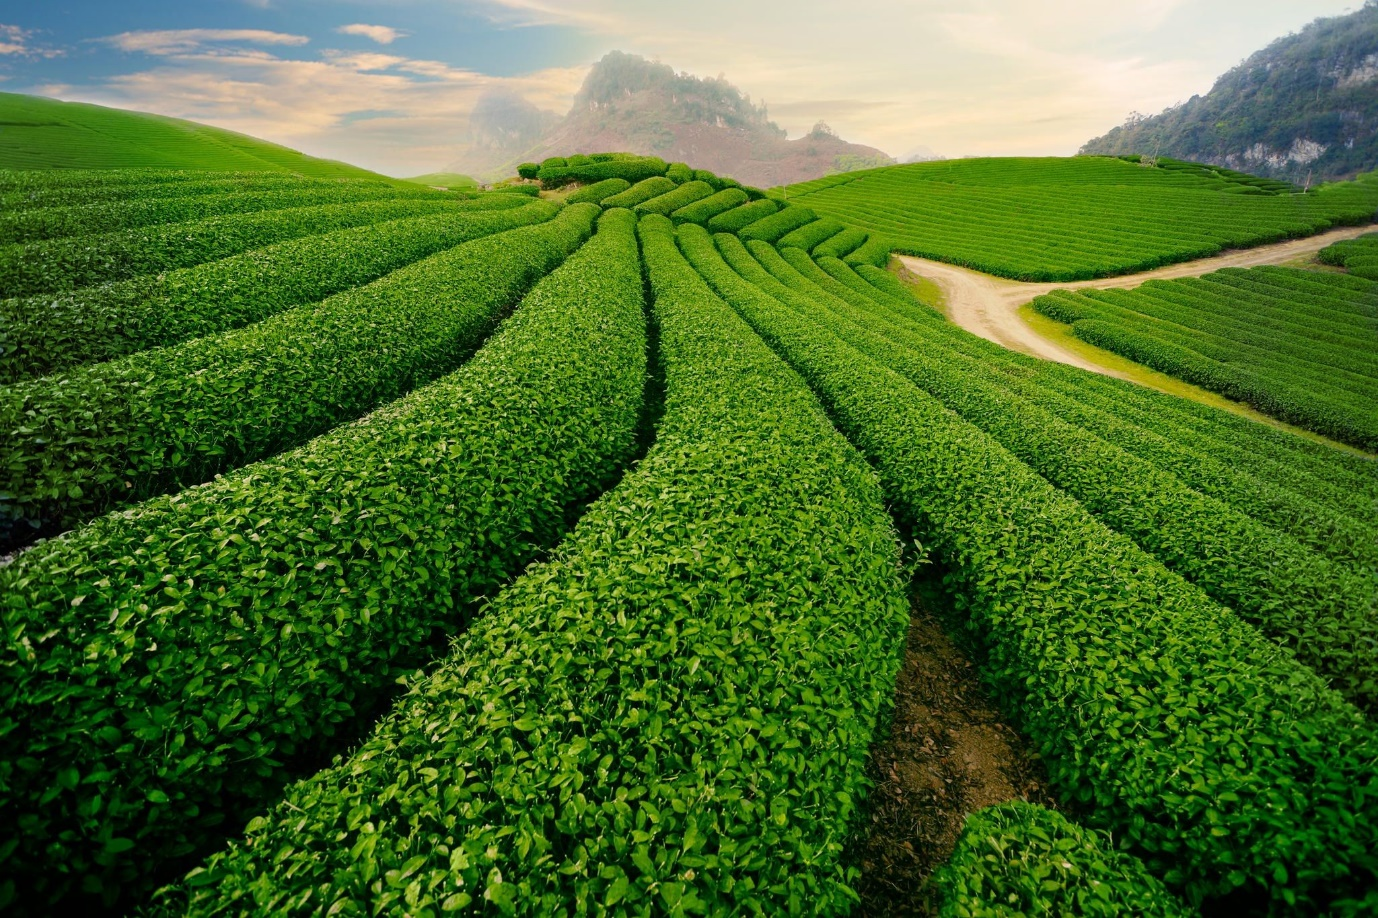 Green Teal Hill in Moc Chau